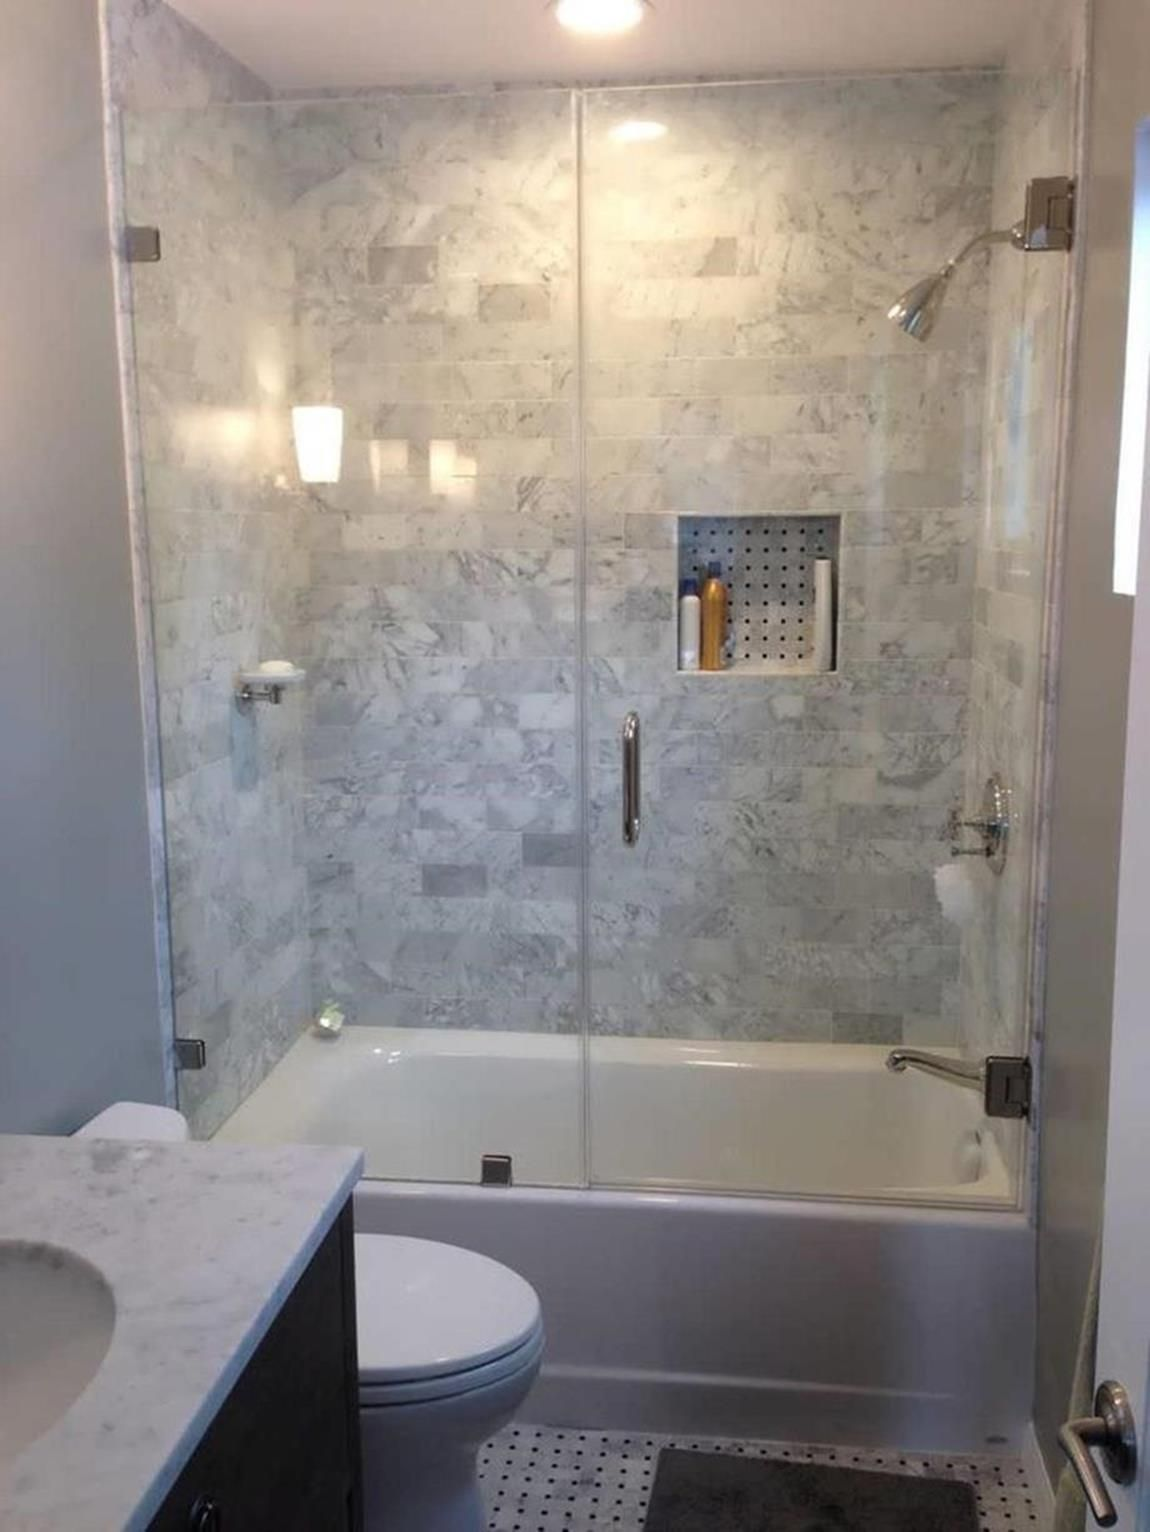 27 Adorable Spa Bathroom Ideas For Small Bathrooms Bathroom